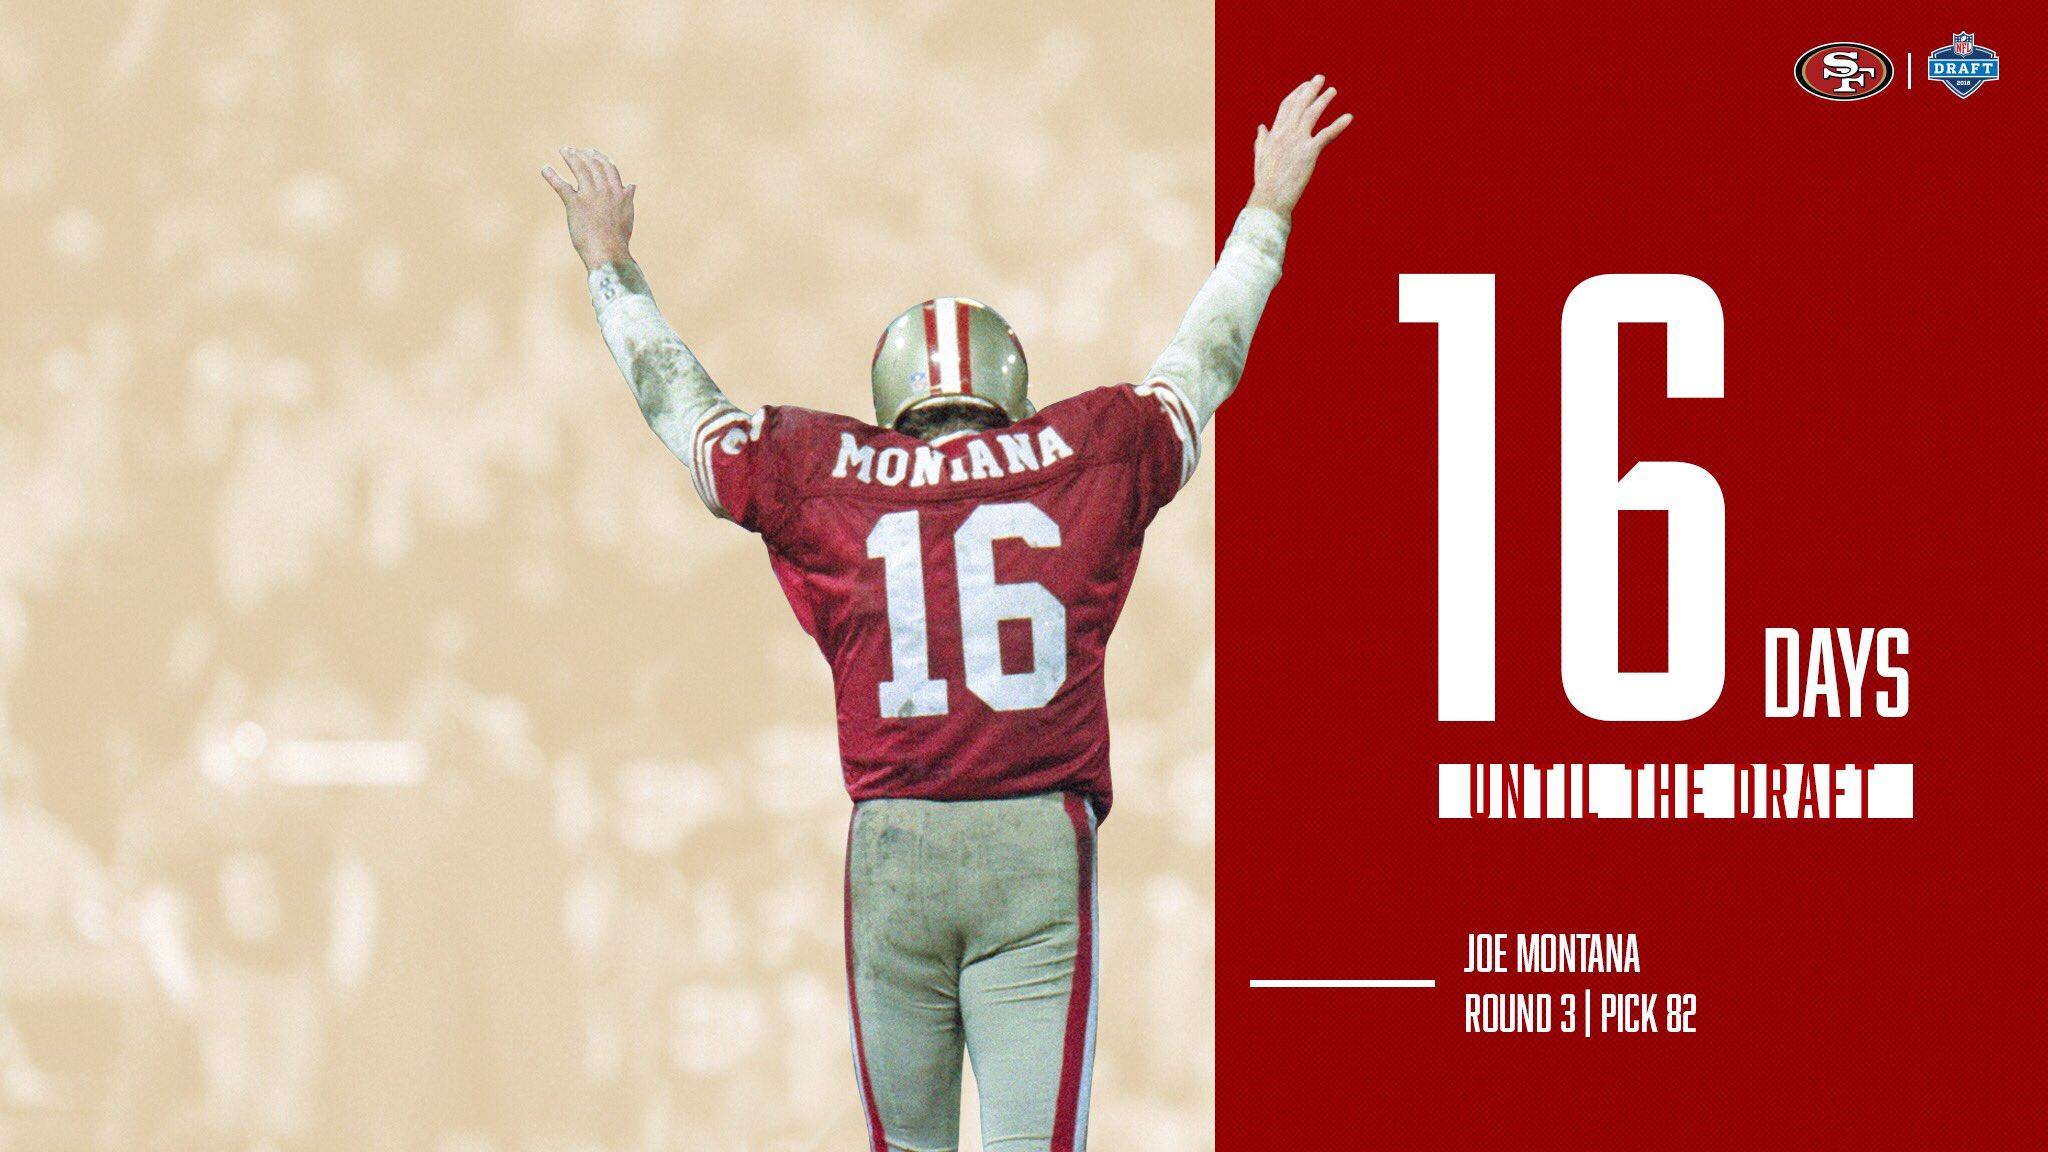 The #NFLDraft is @JoeMontana days away! �� https://t.co/6Y1DbIlZ1U